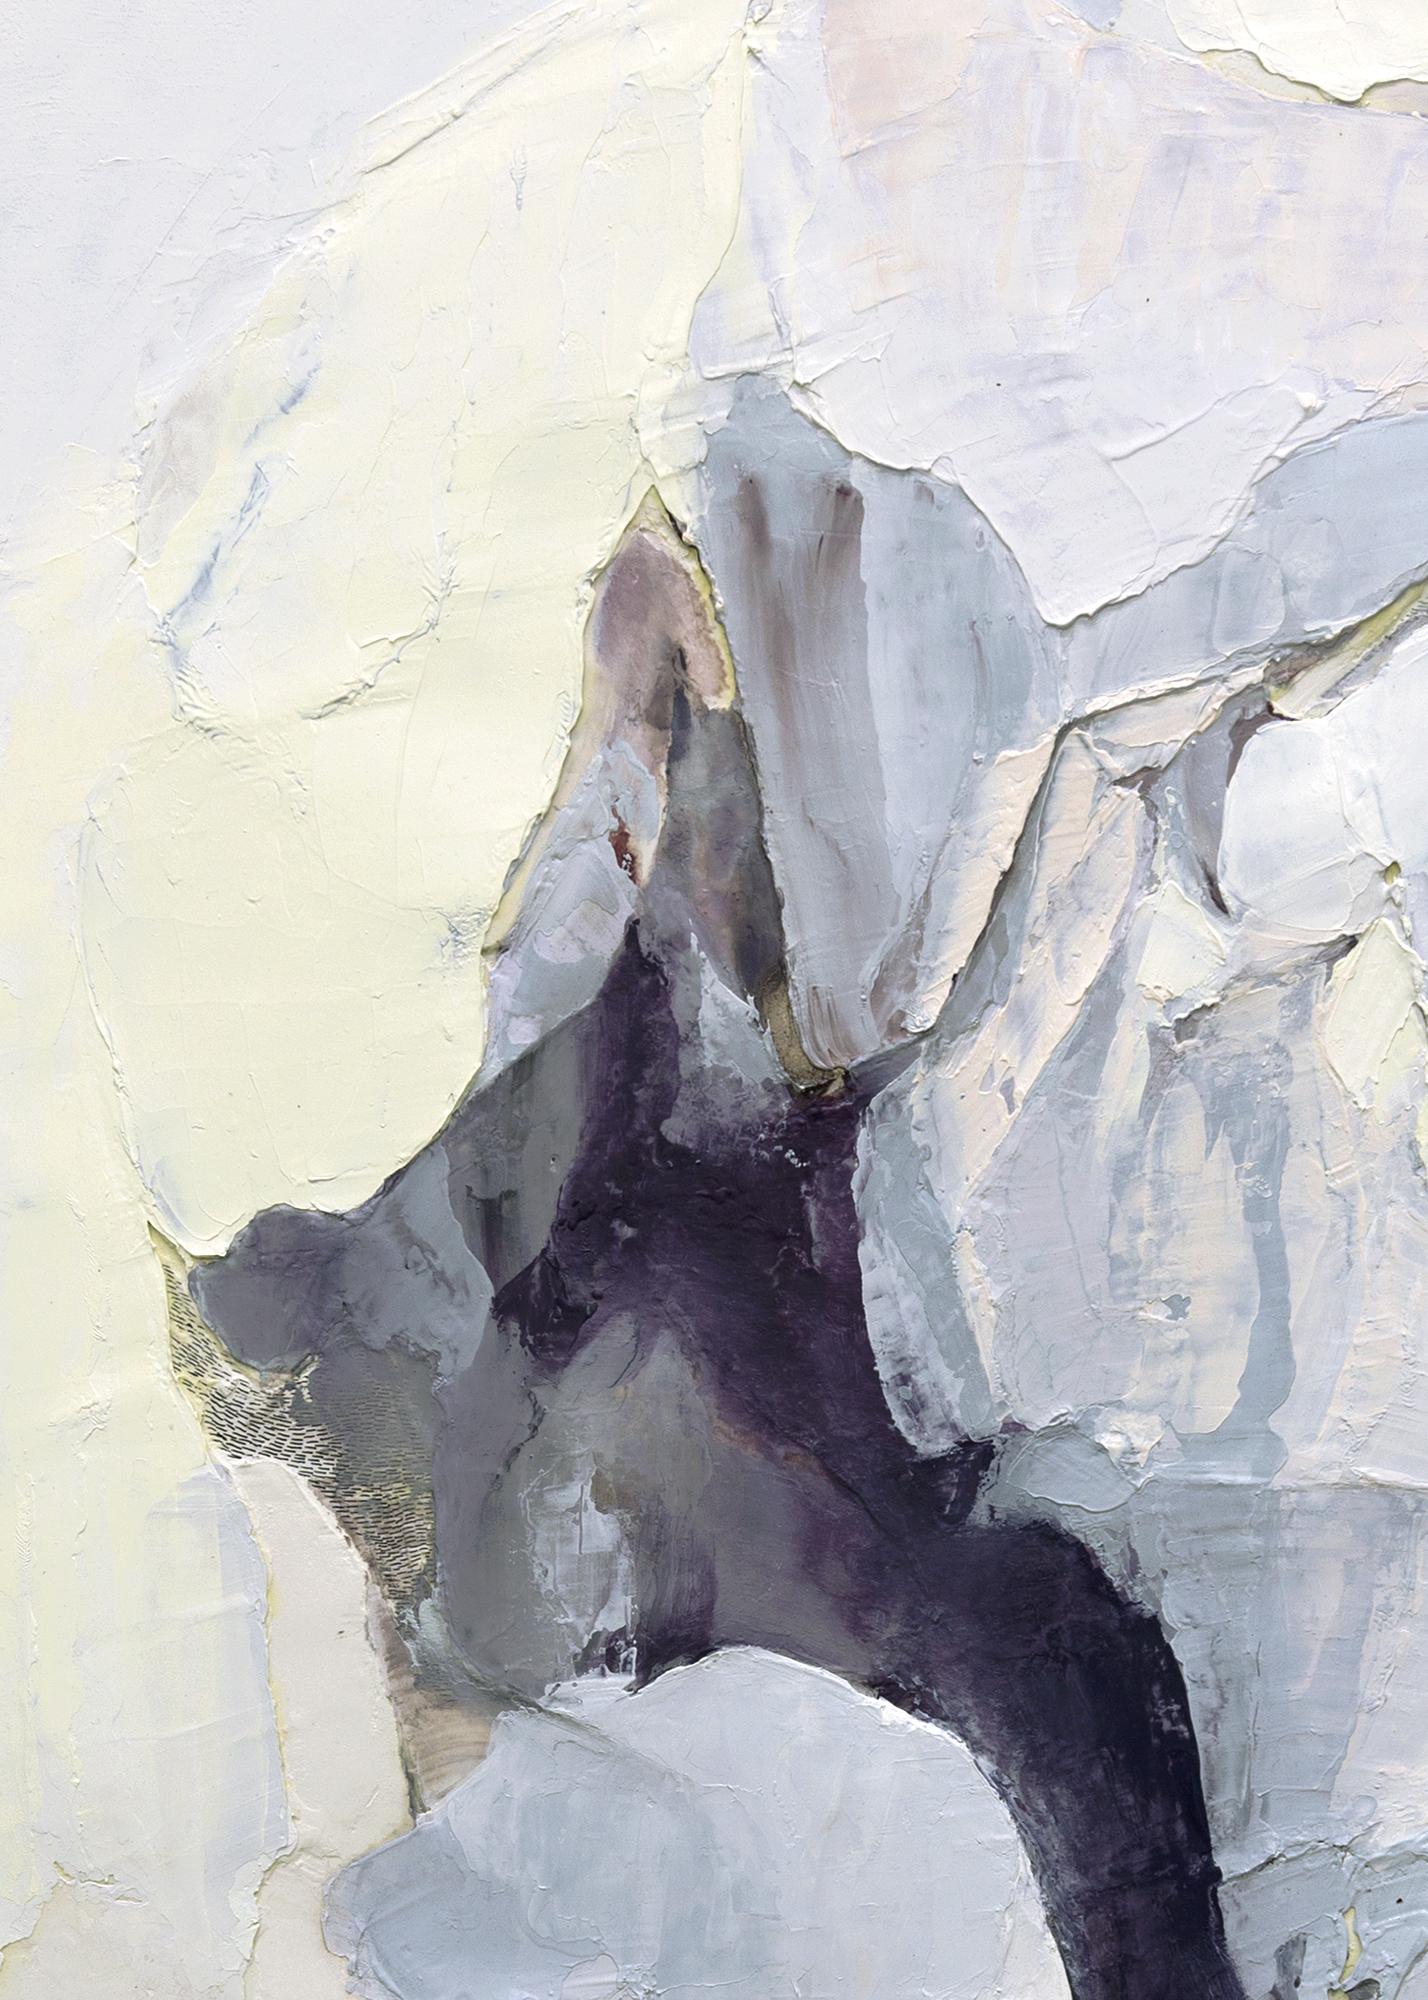 Detail of Untitled (Tectonic II), 2017